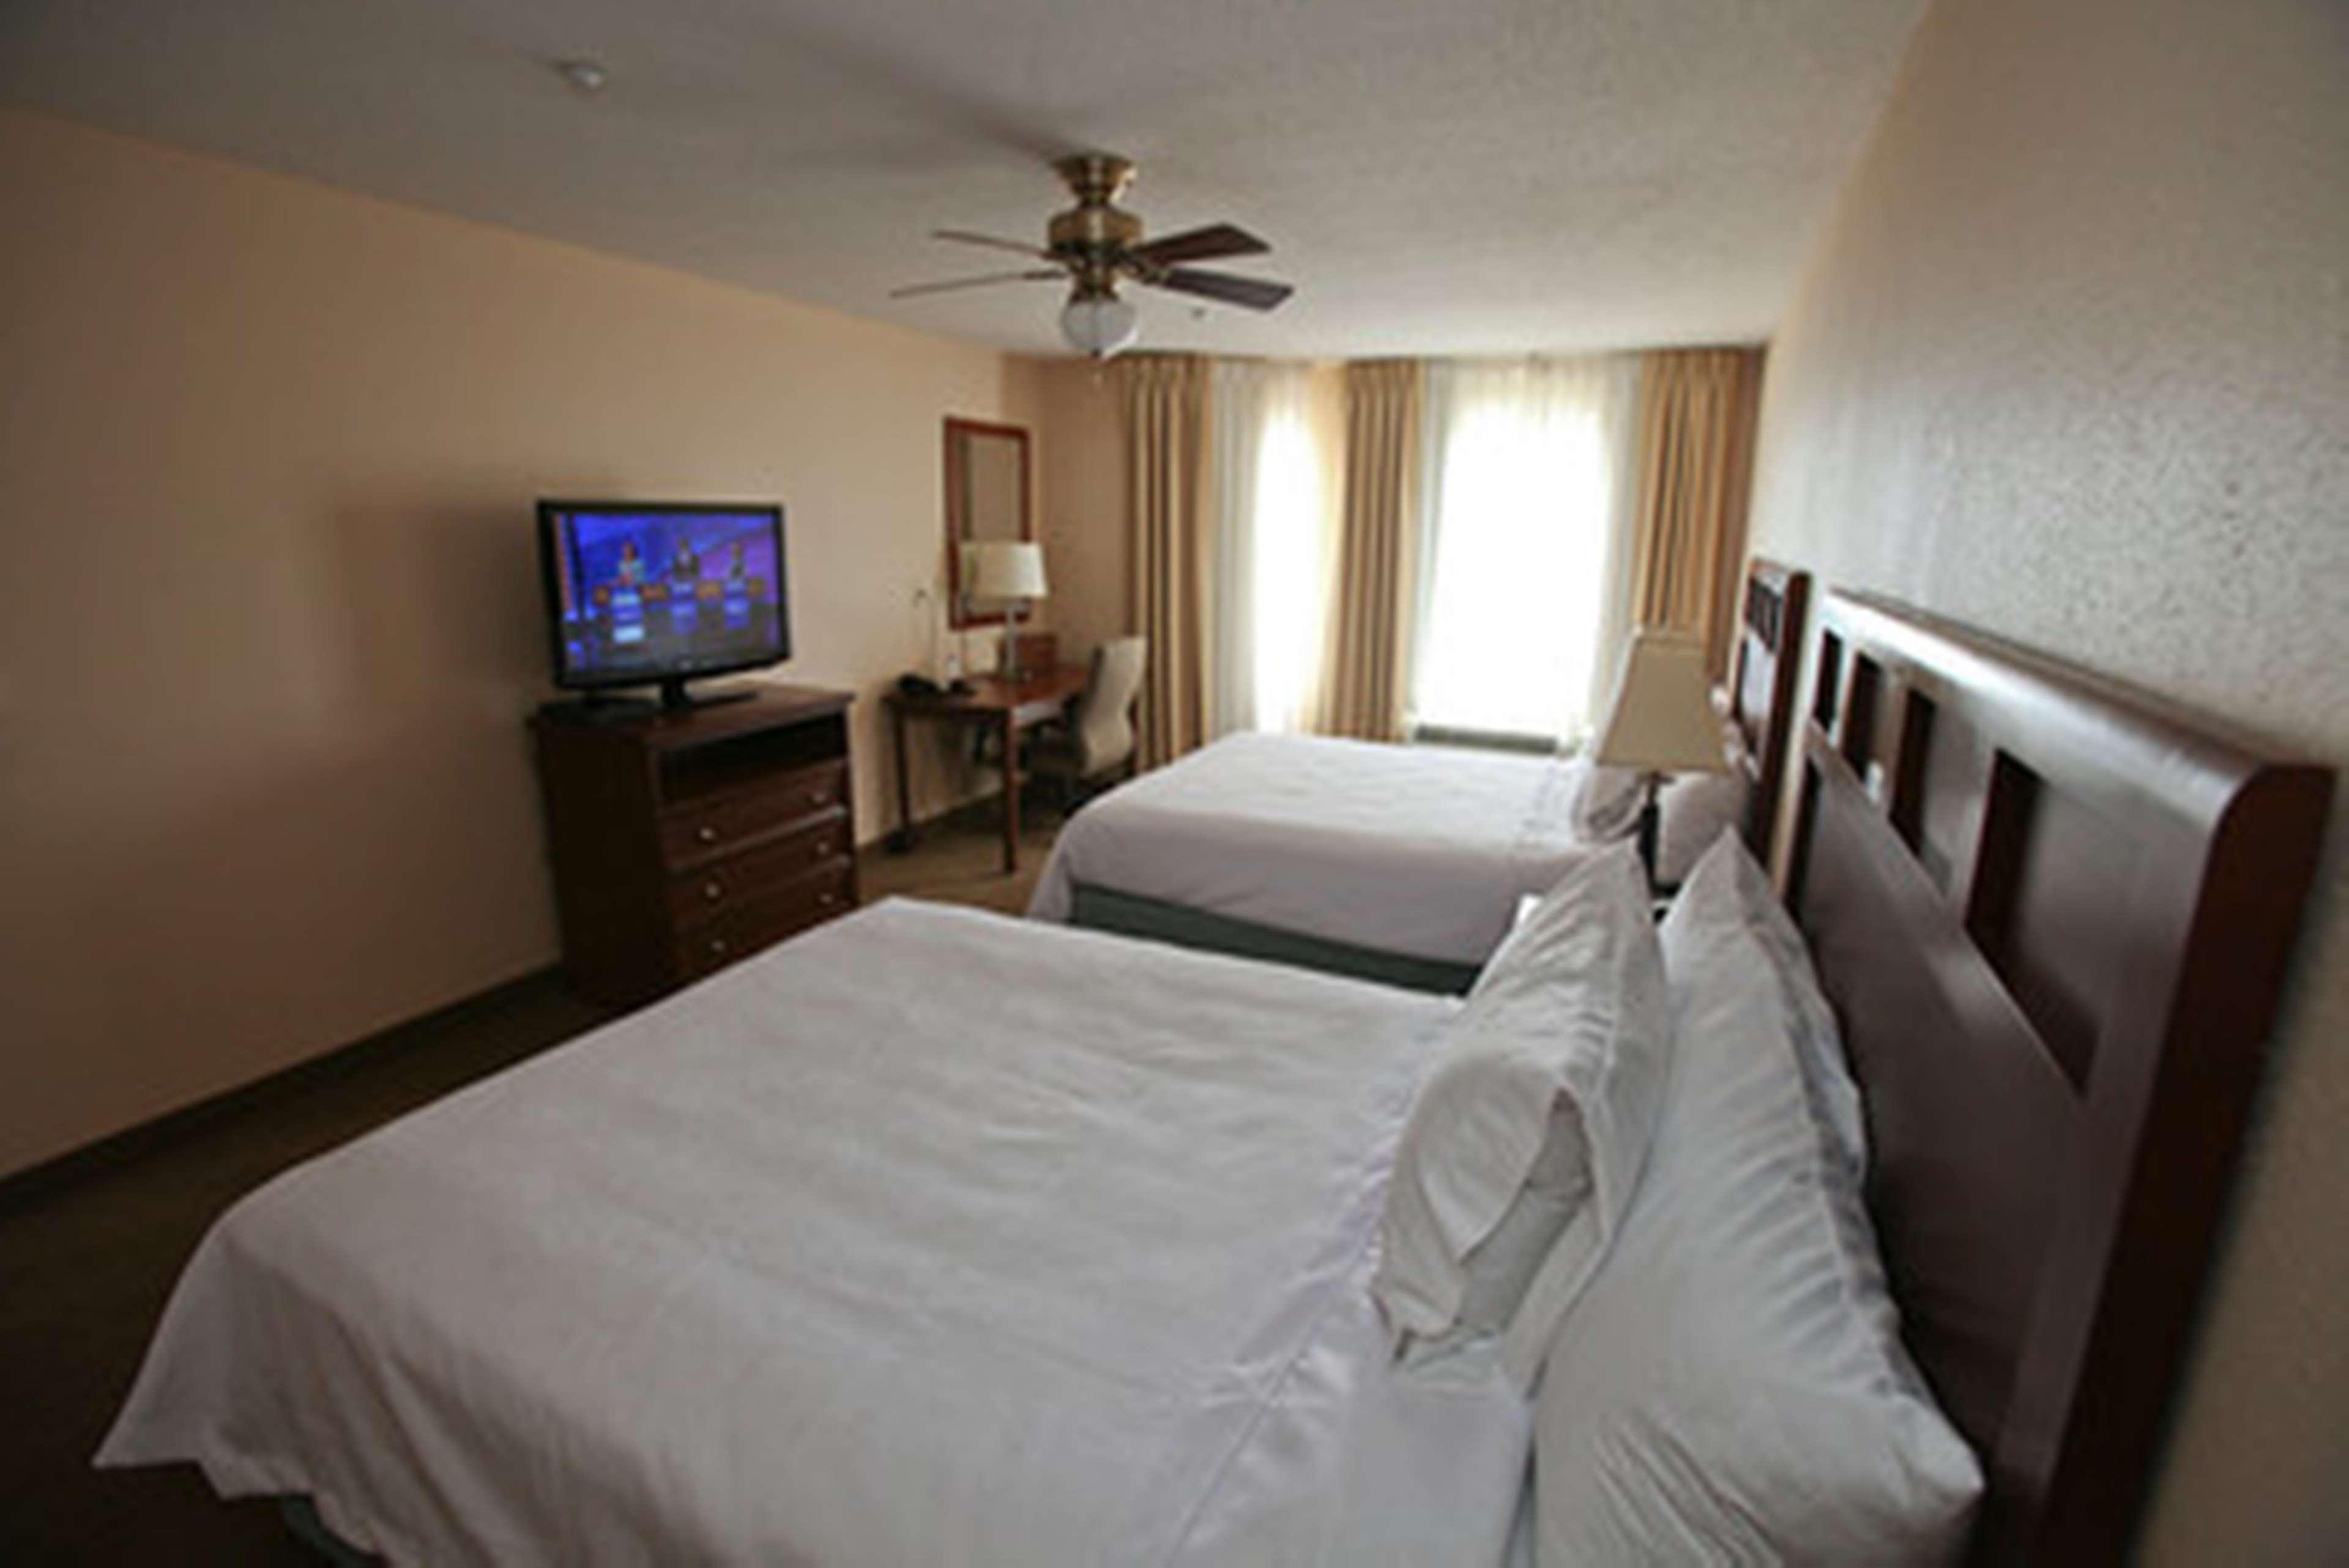 Homewood Suites by Hilton Orland Park image 26